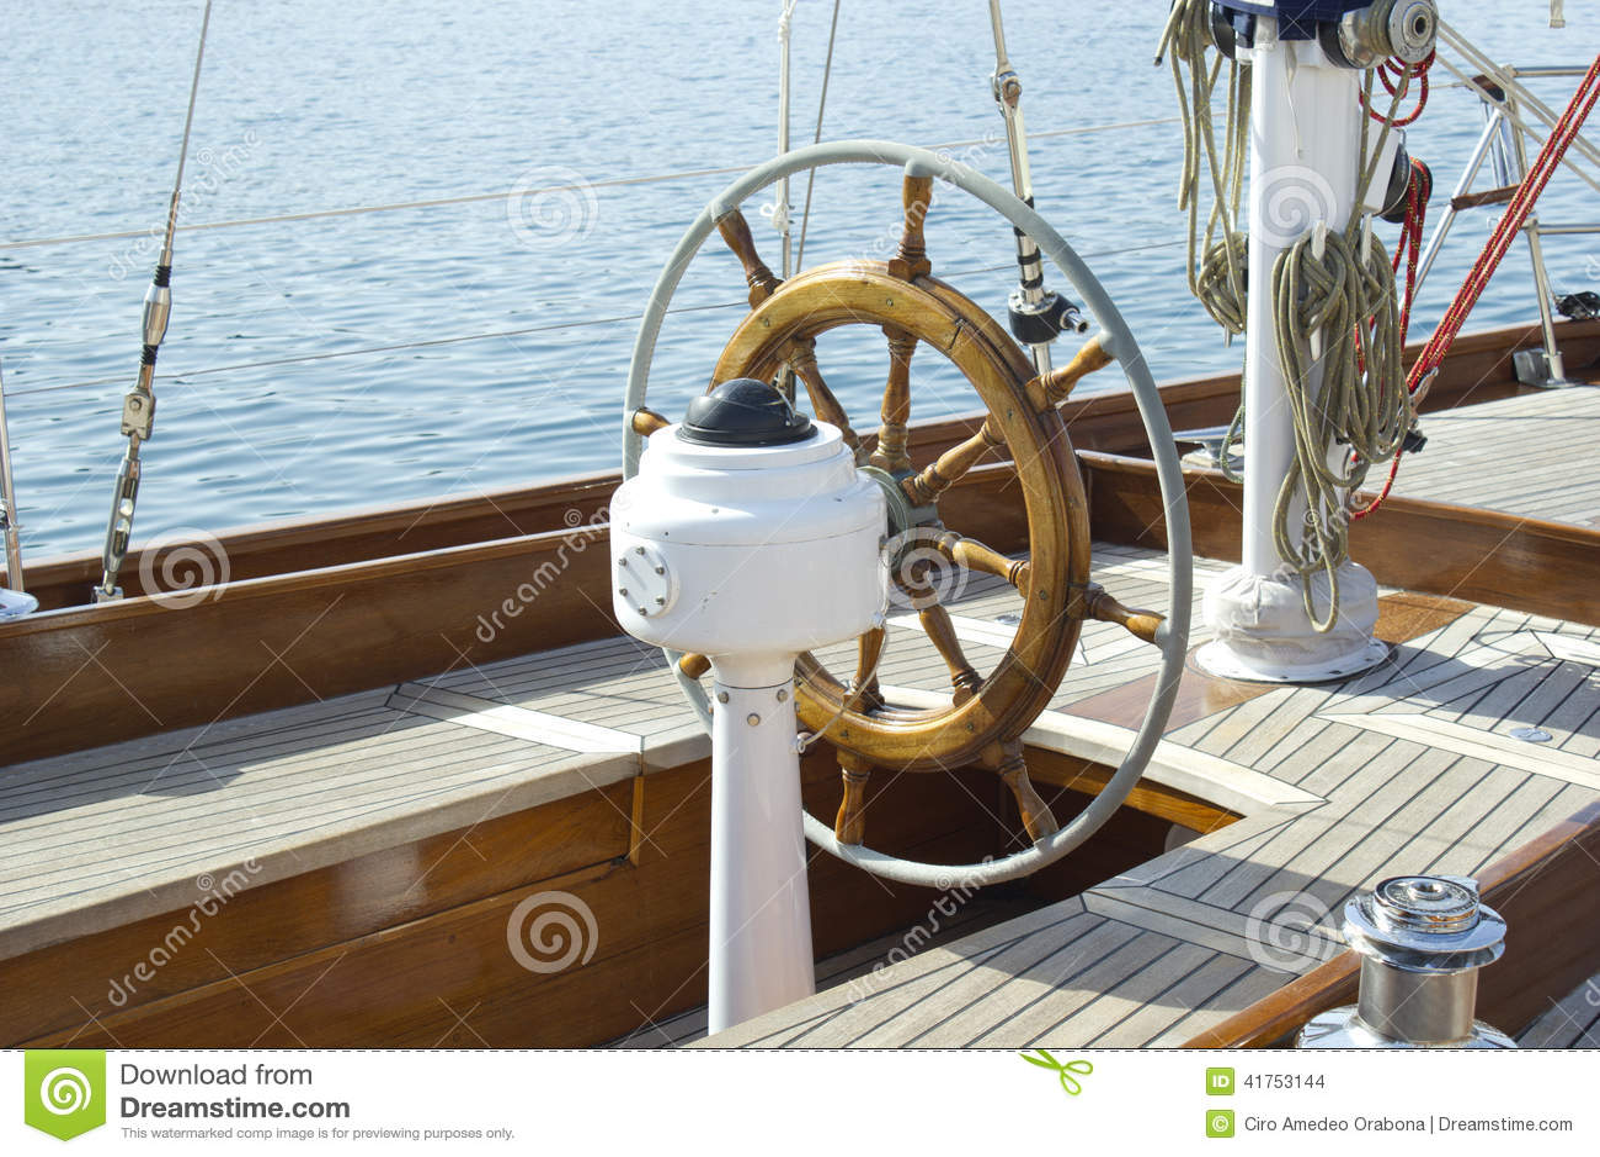 Helm sailboat stock photo. Image of transportation, teak ...